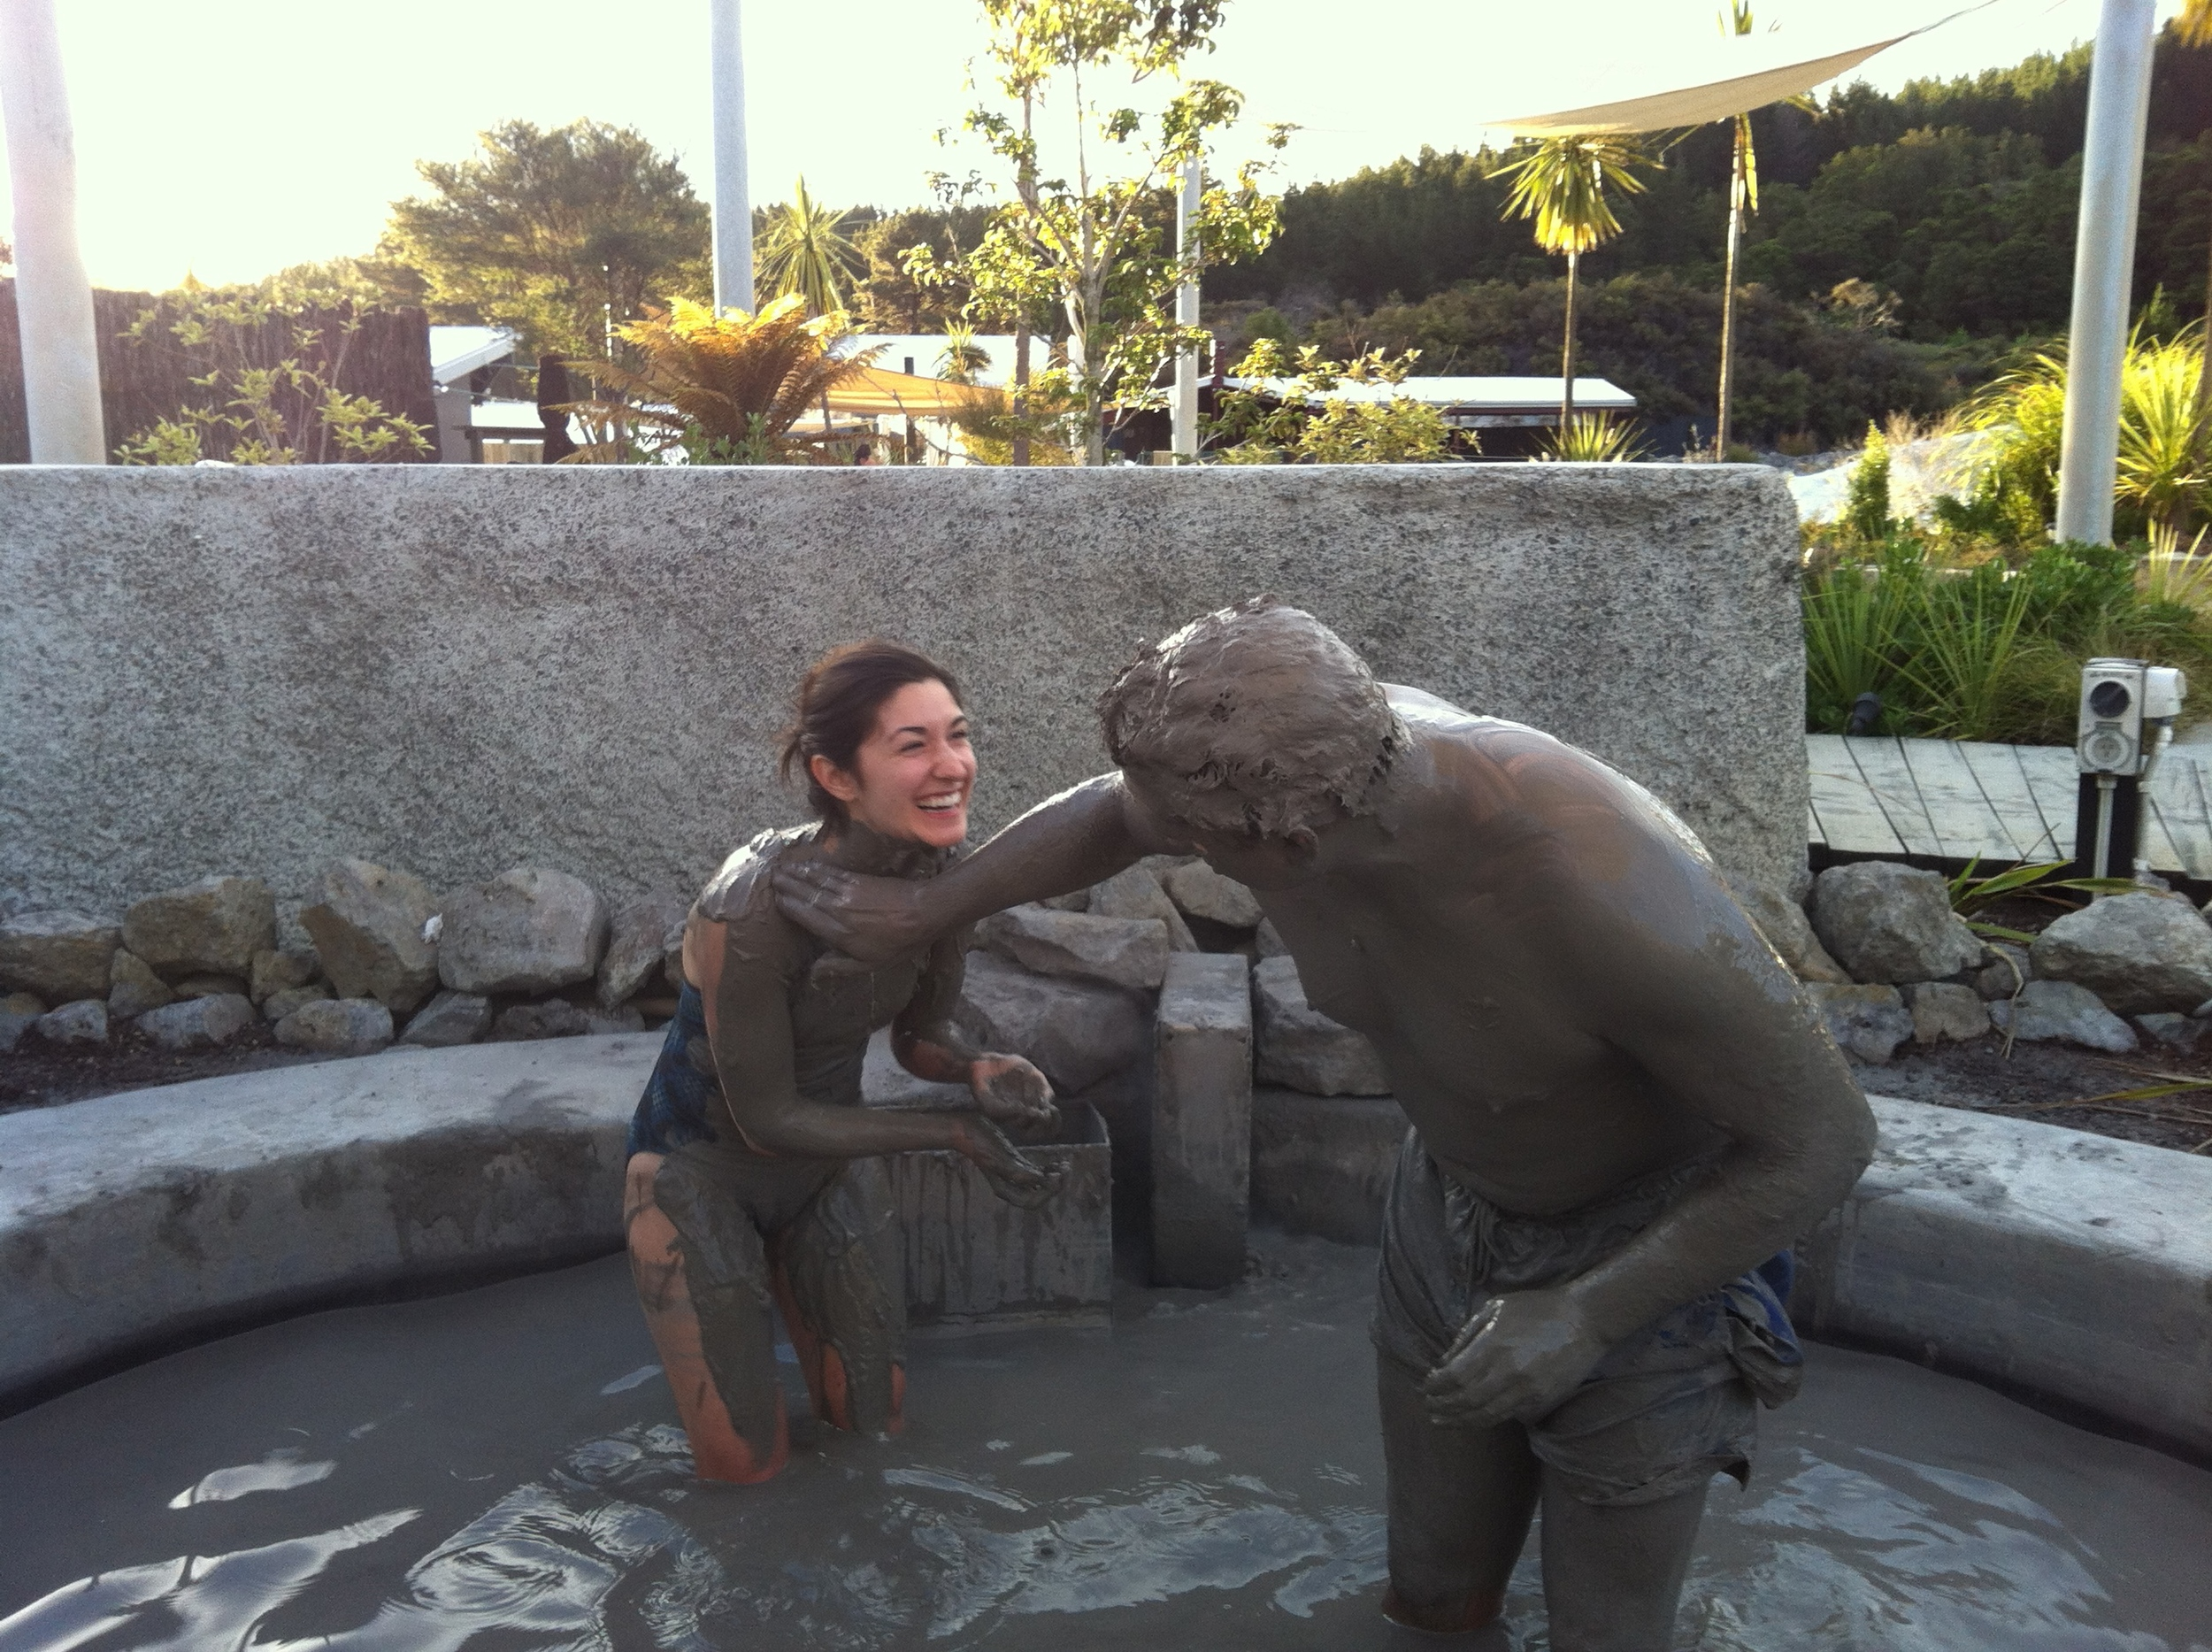 Joe painting Gabrielle with mud.